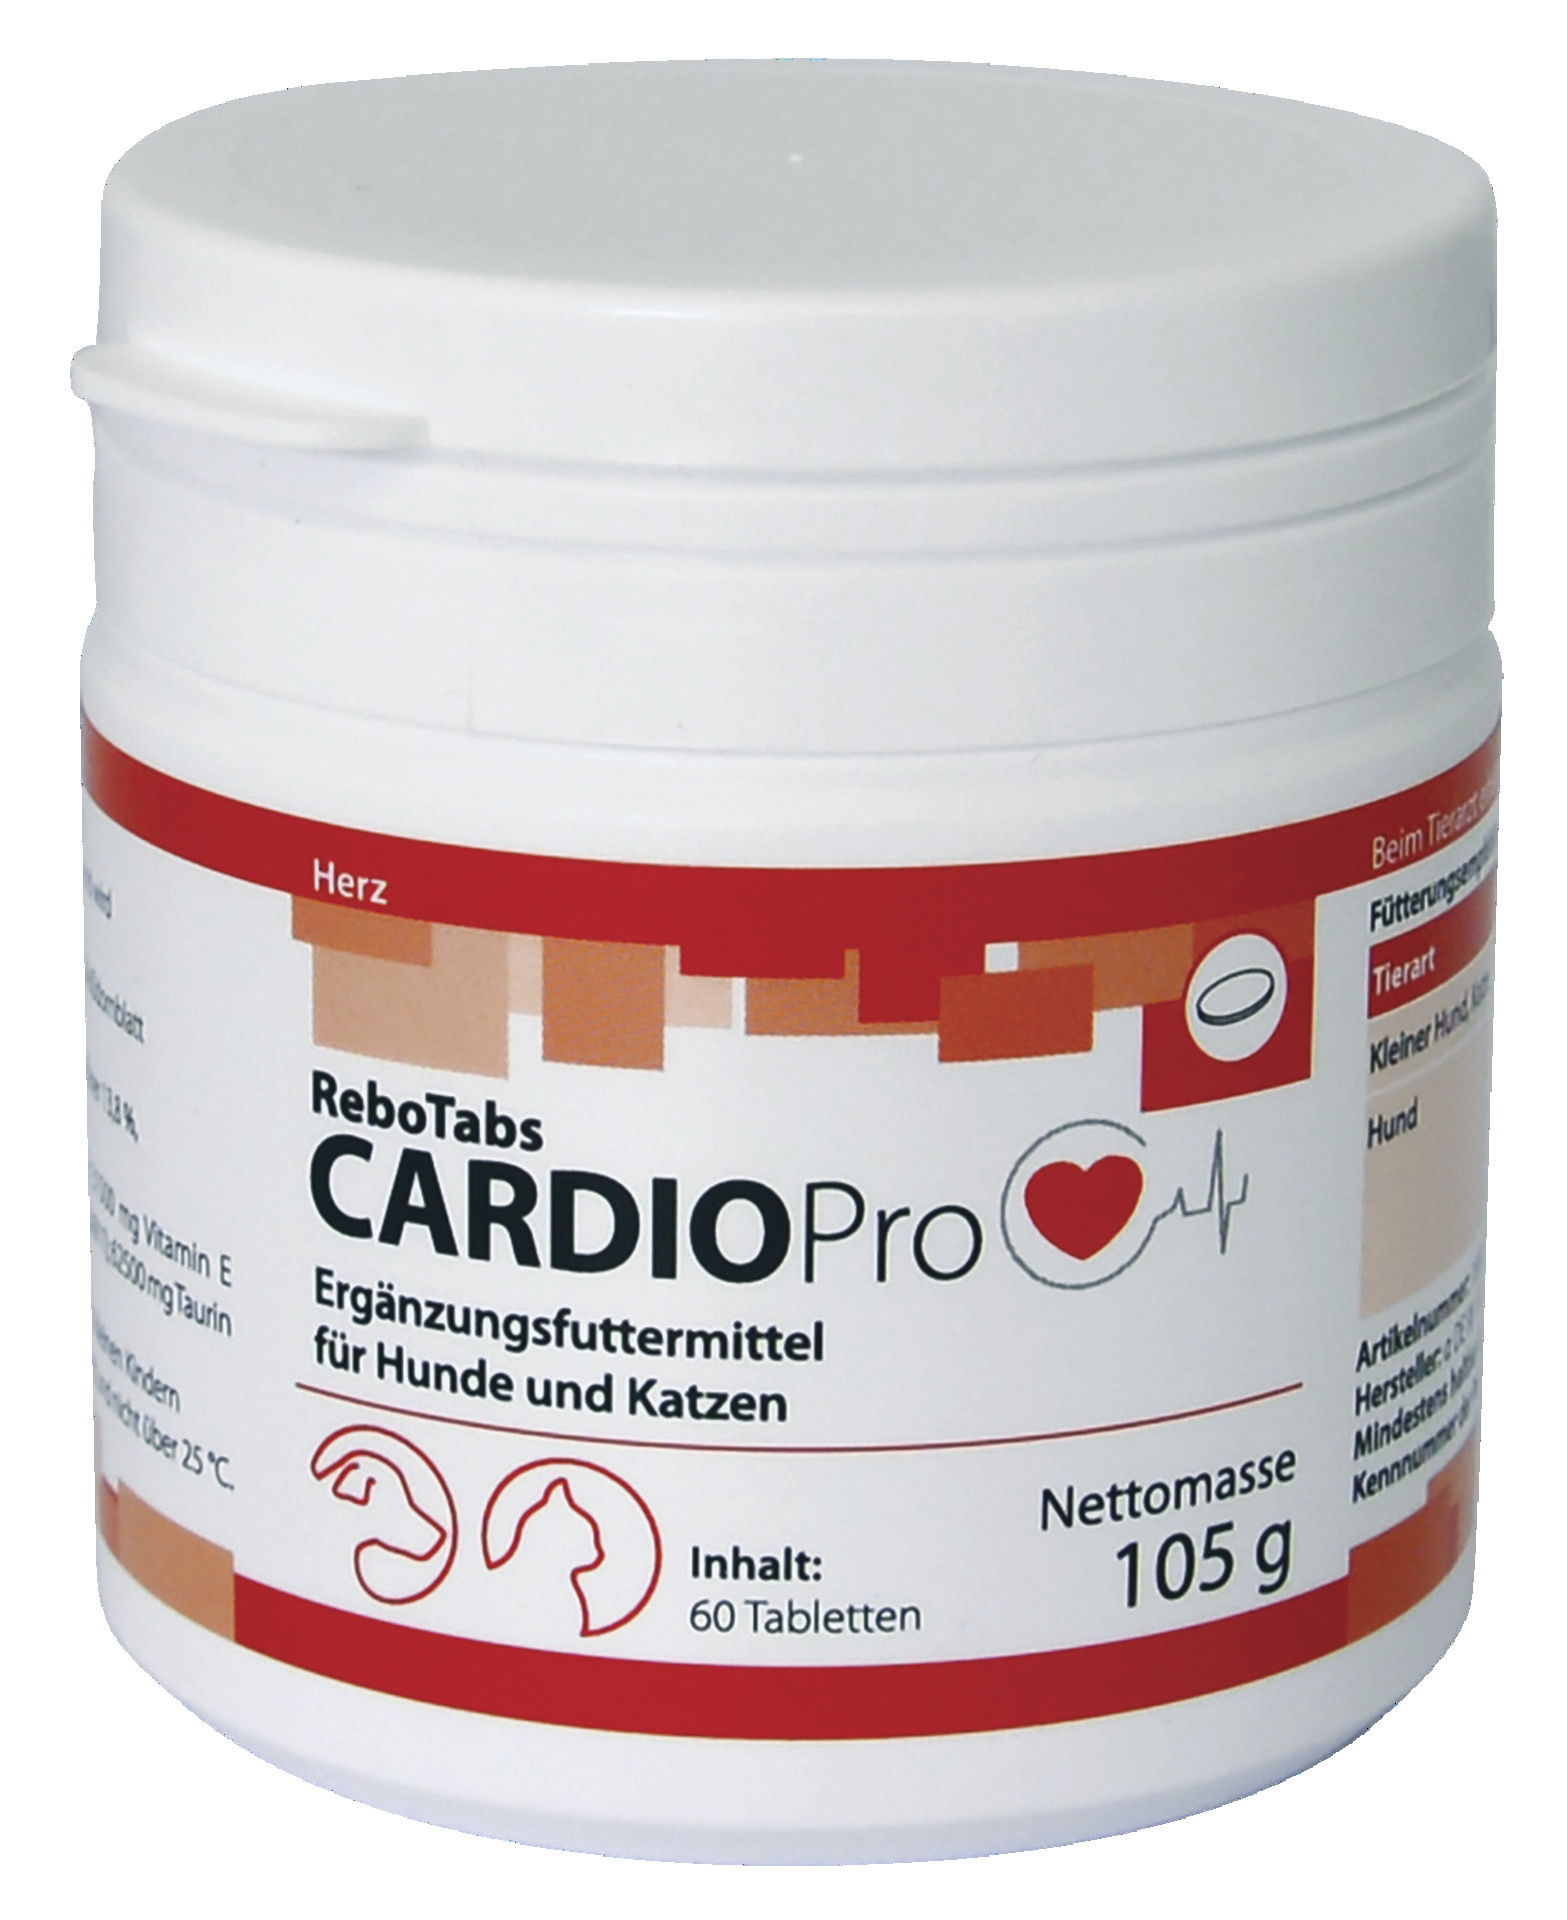 CARDIOPro Tabletten